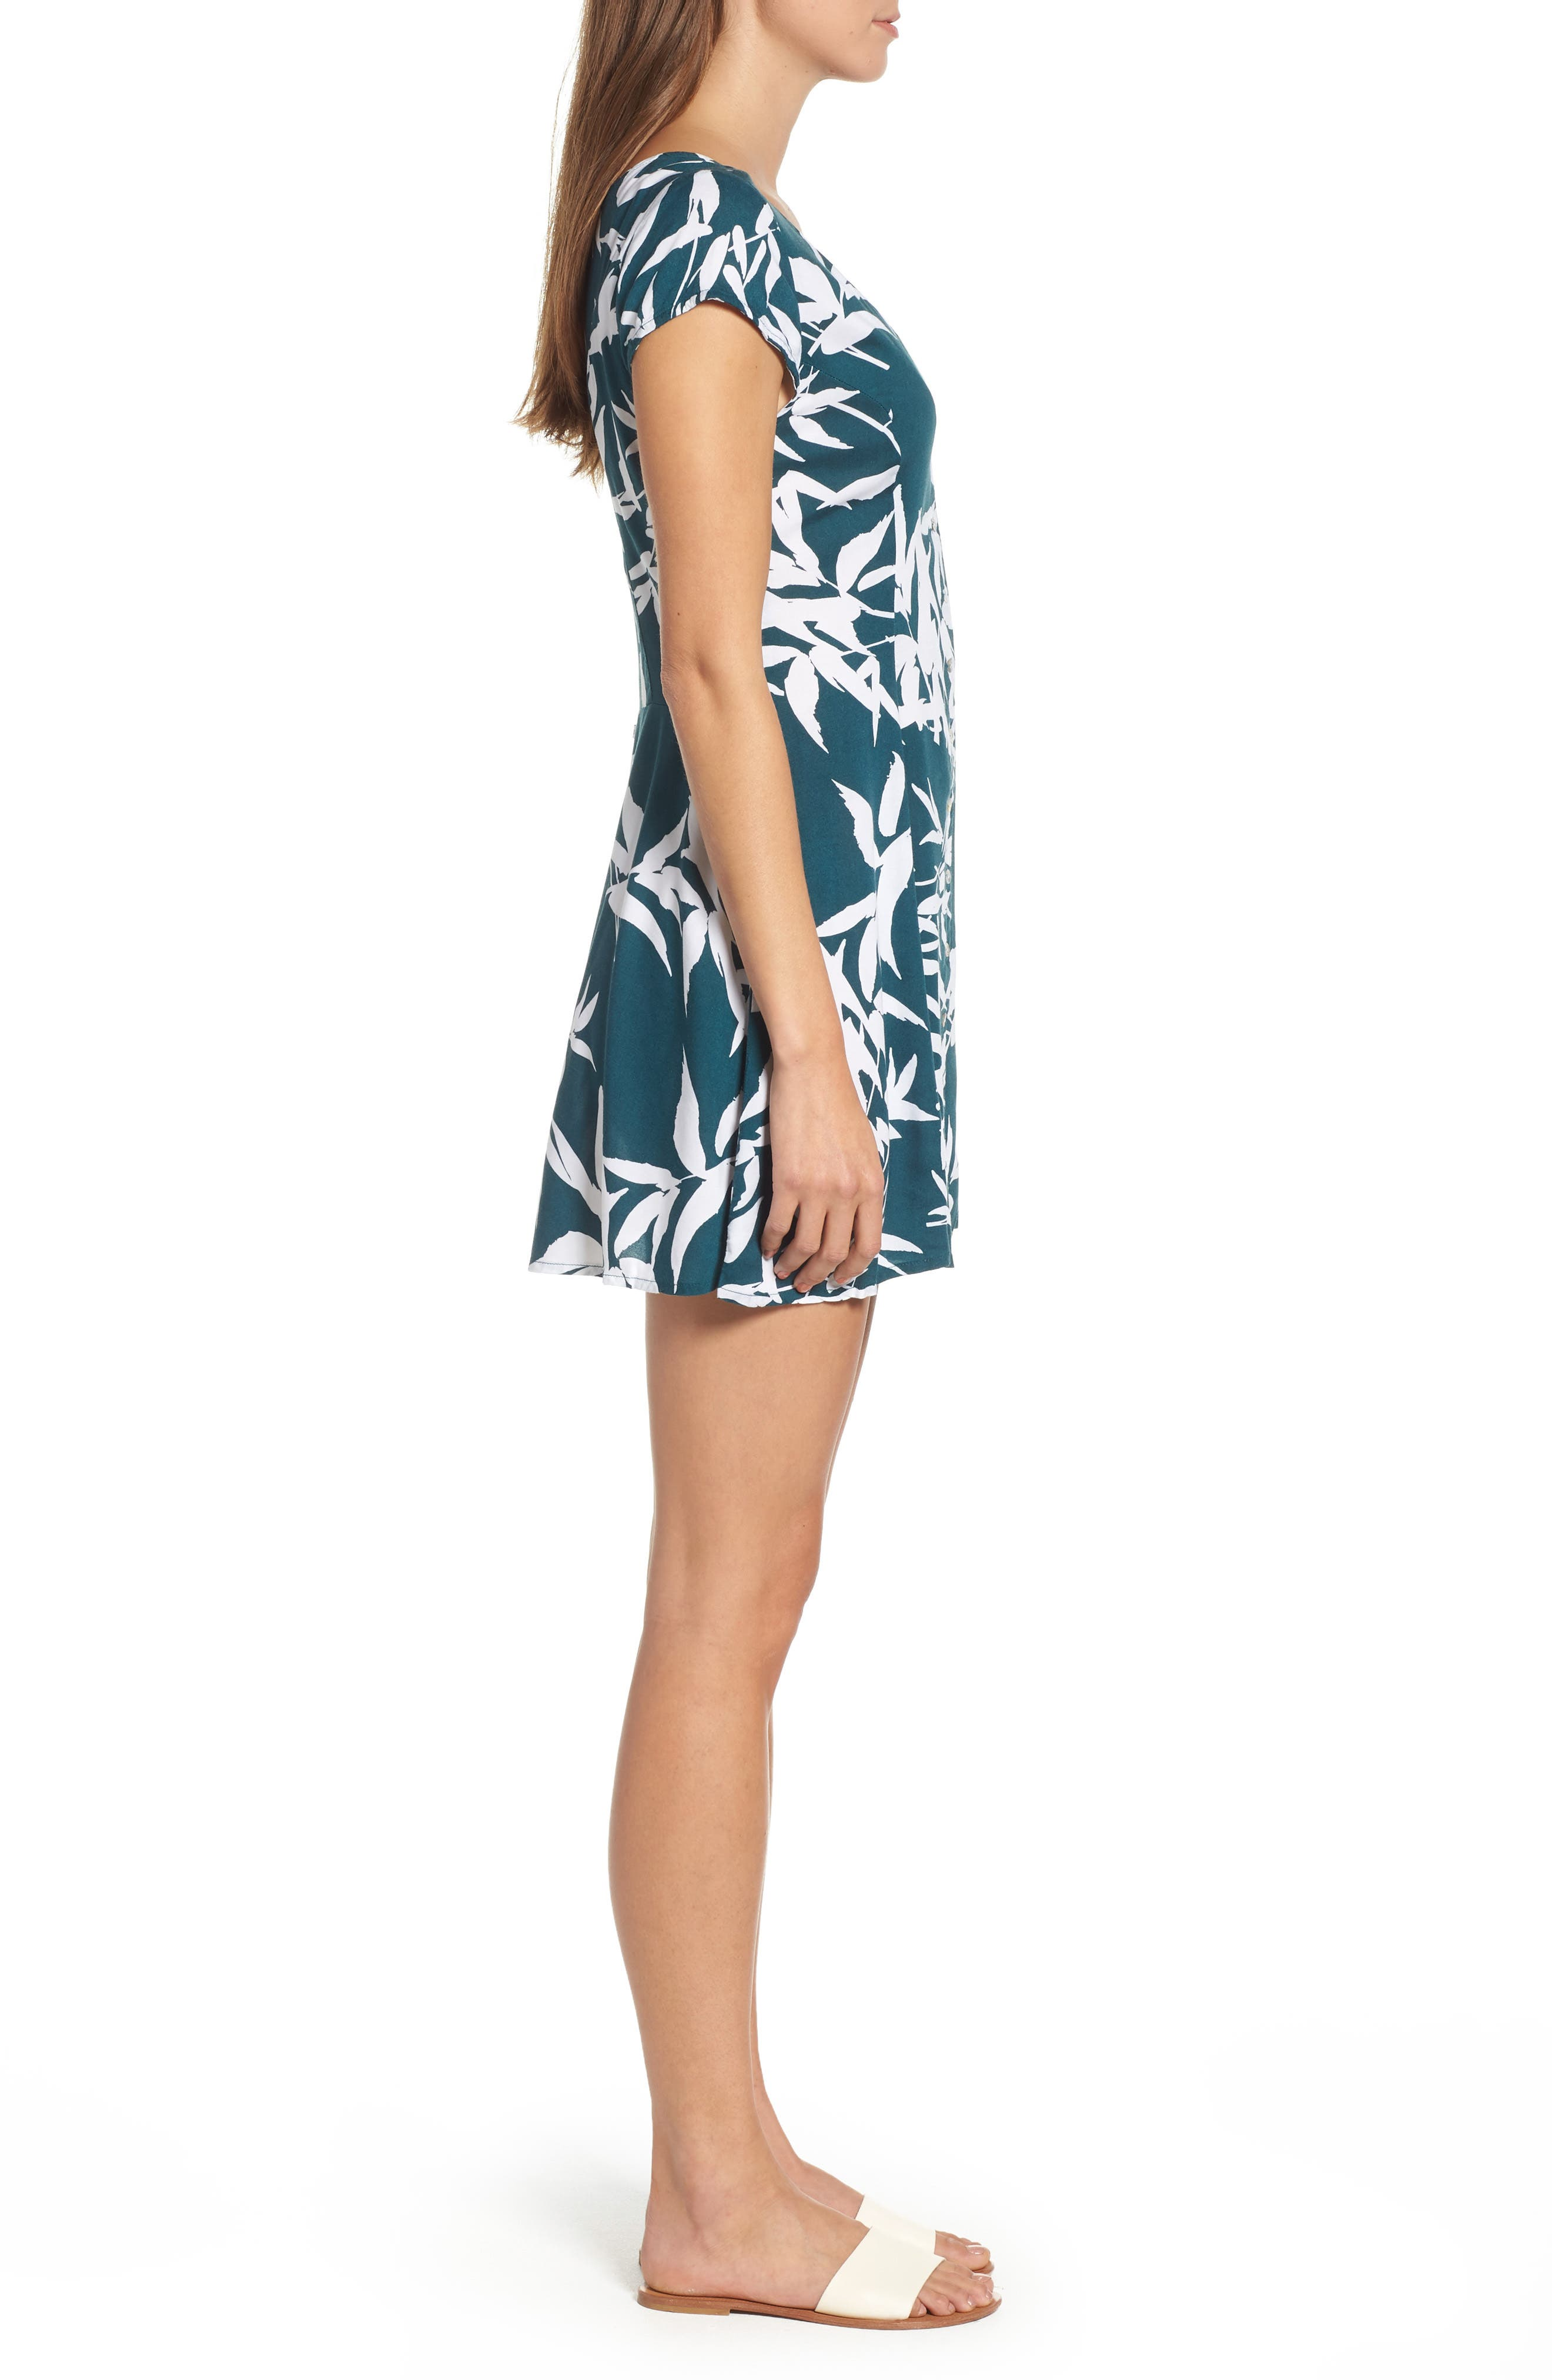 Calico Leaf Print Dress,                             Alternate thumbnail 3, color,                             Spruce Multi